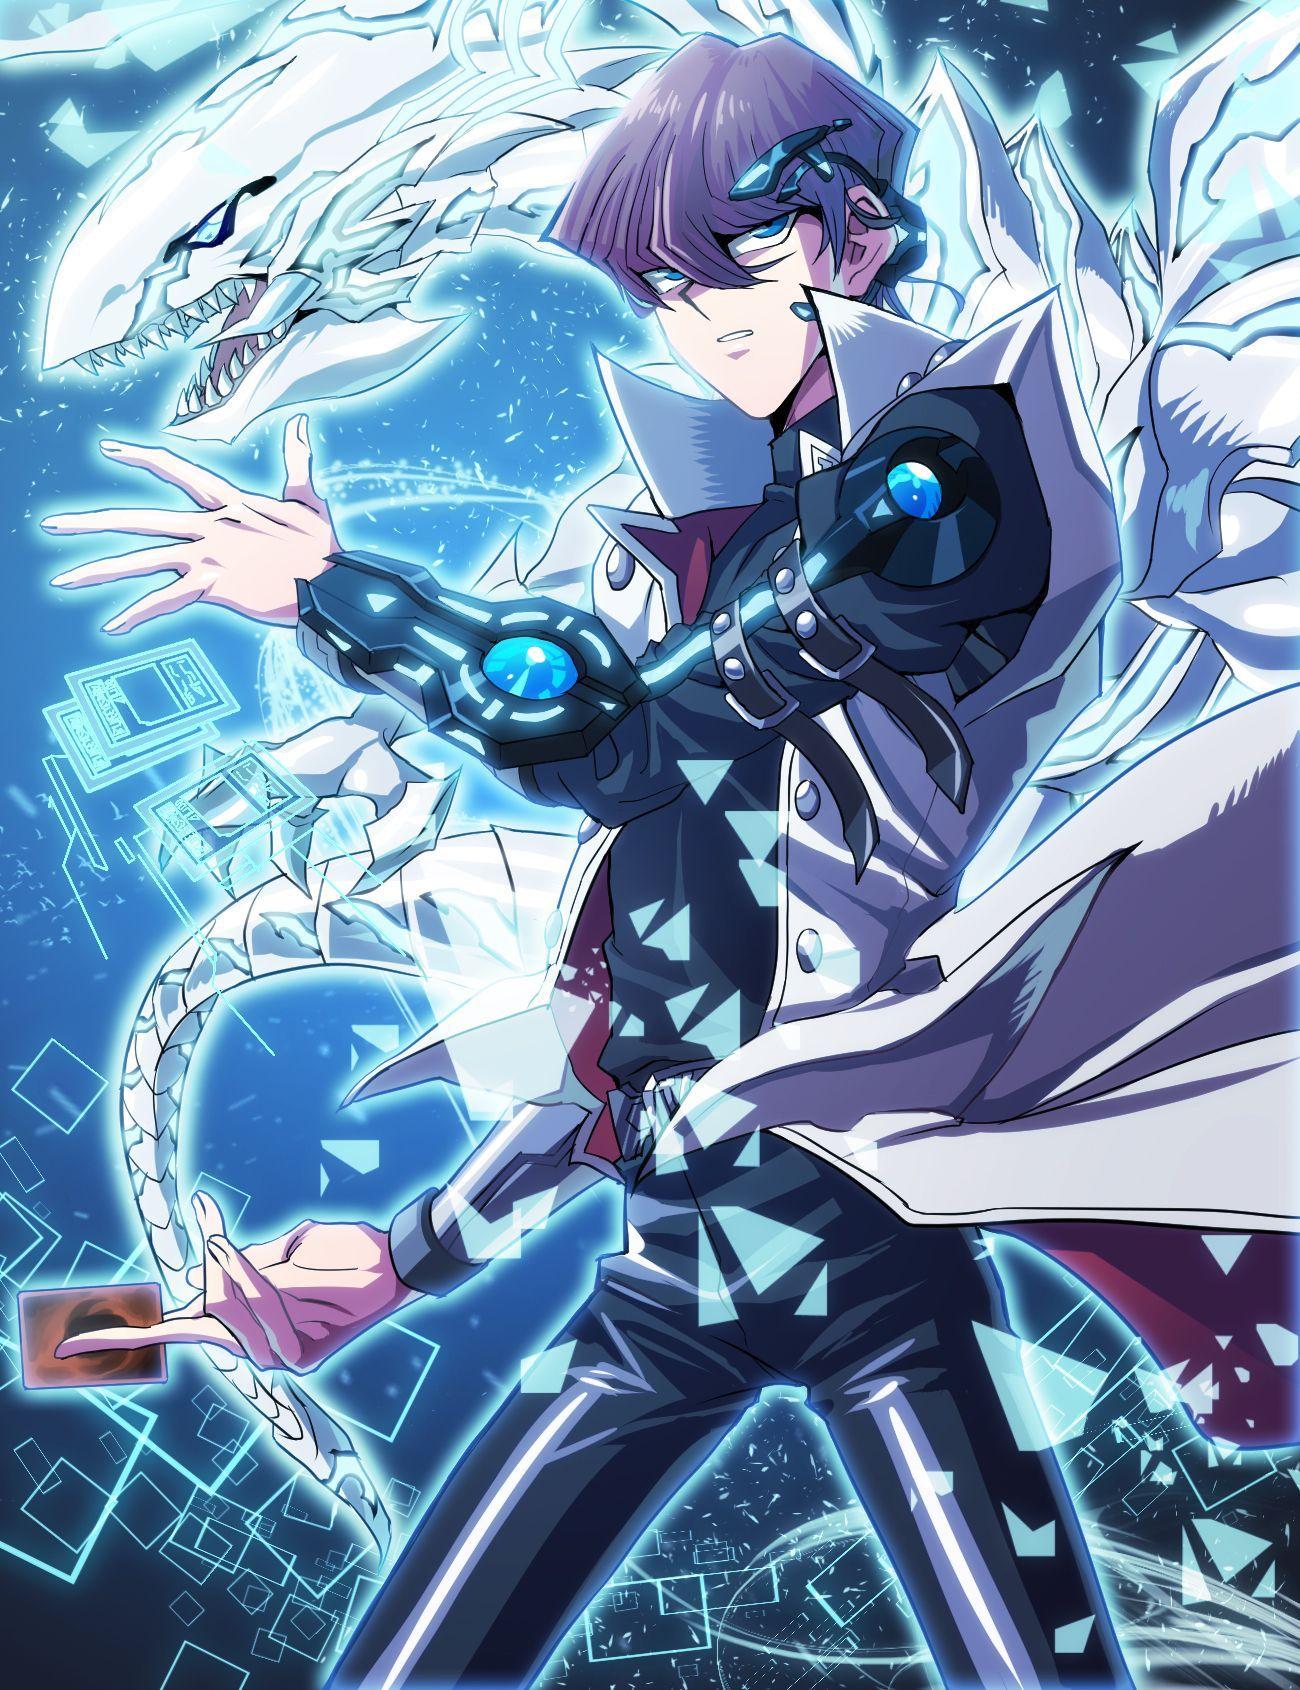 Pin by 3njeru on アニメ Yugioh, Anime, Dark side of dimensions